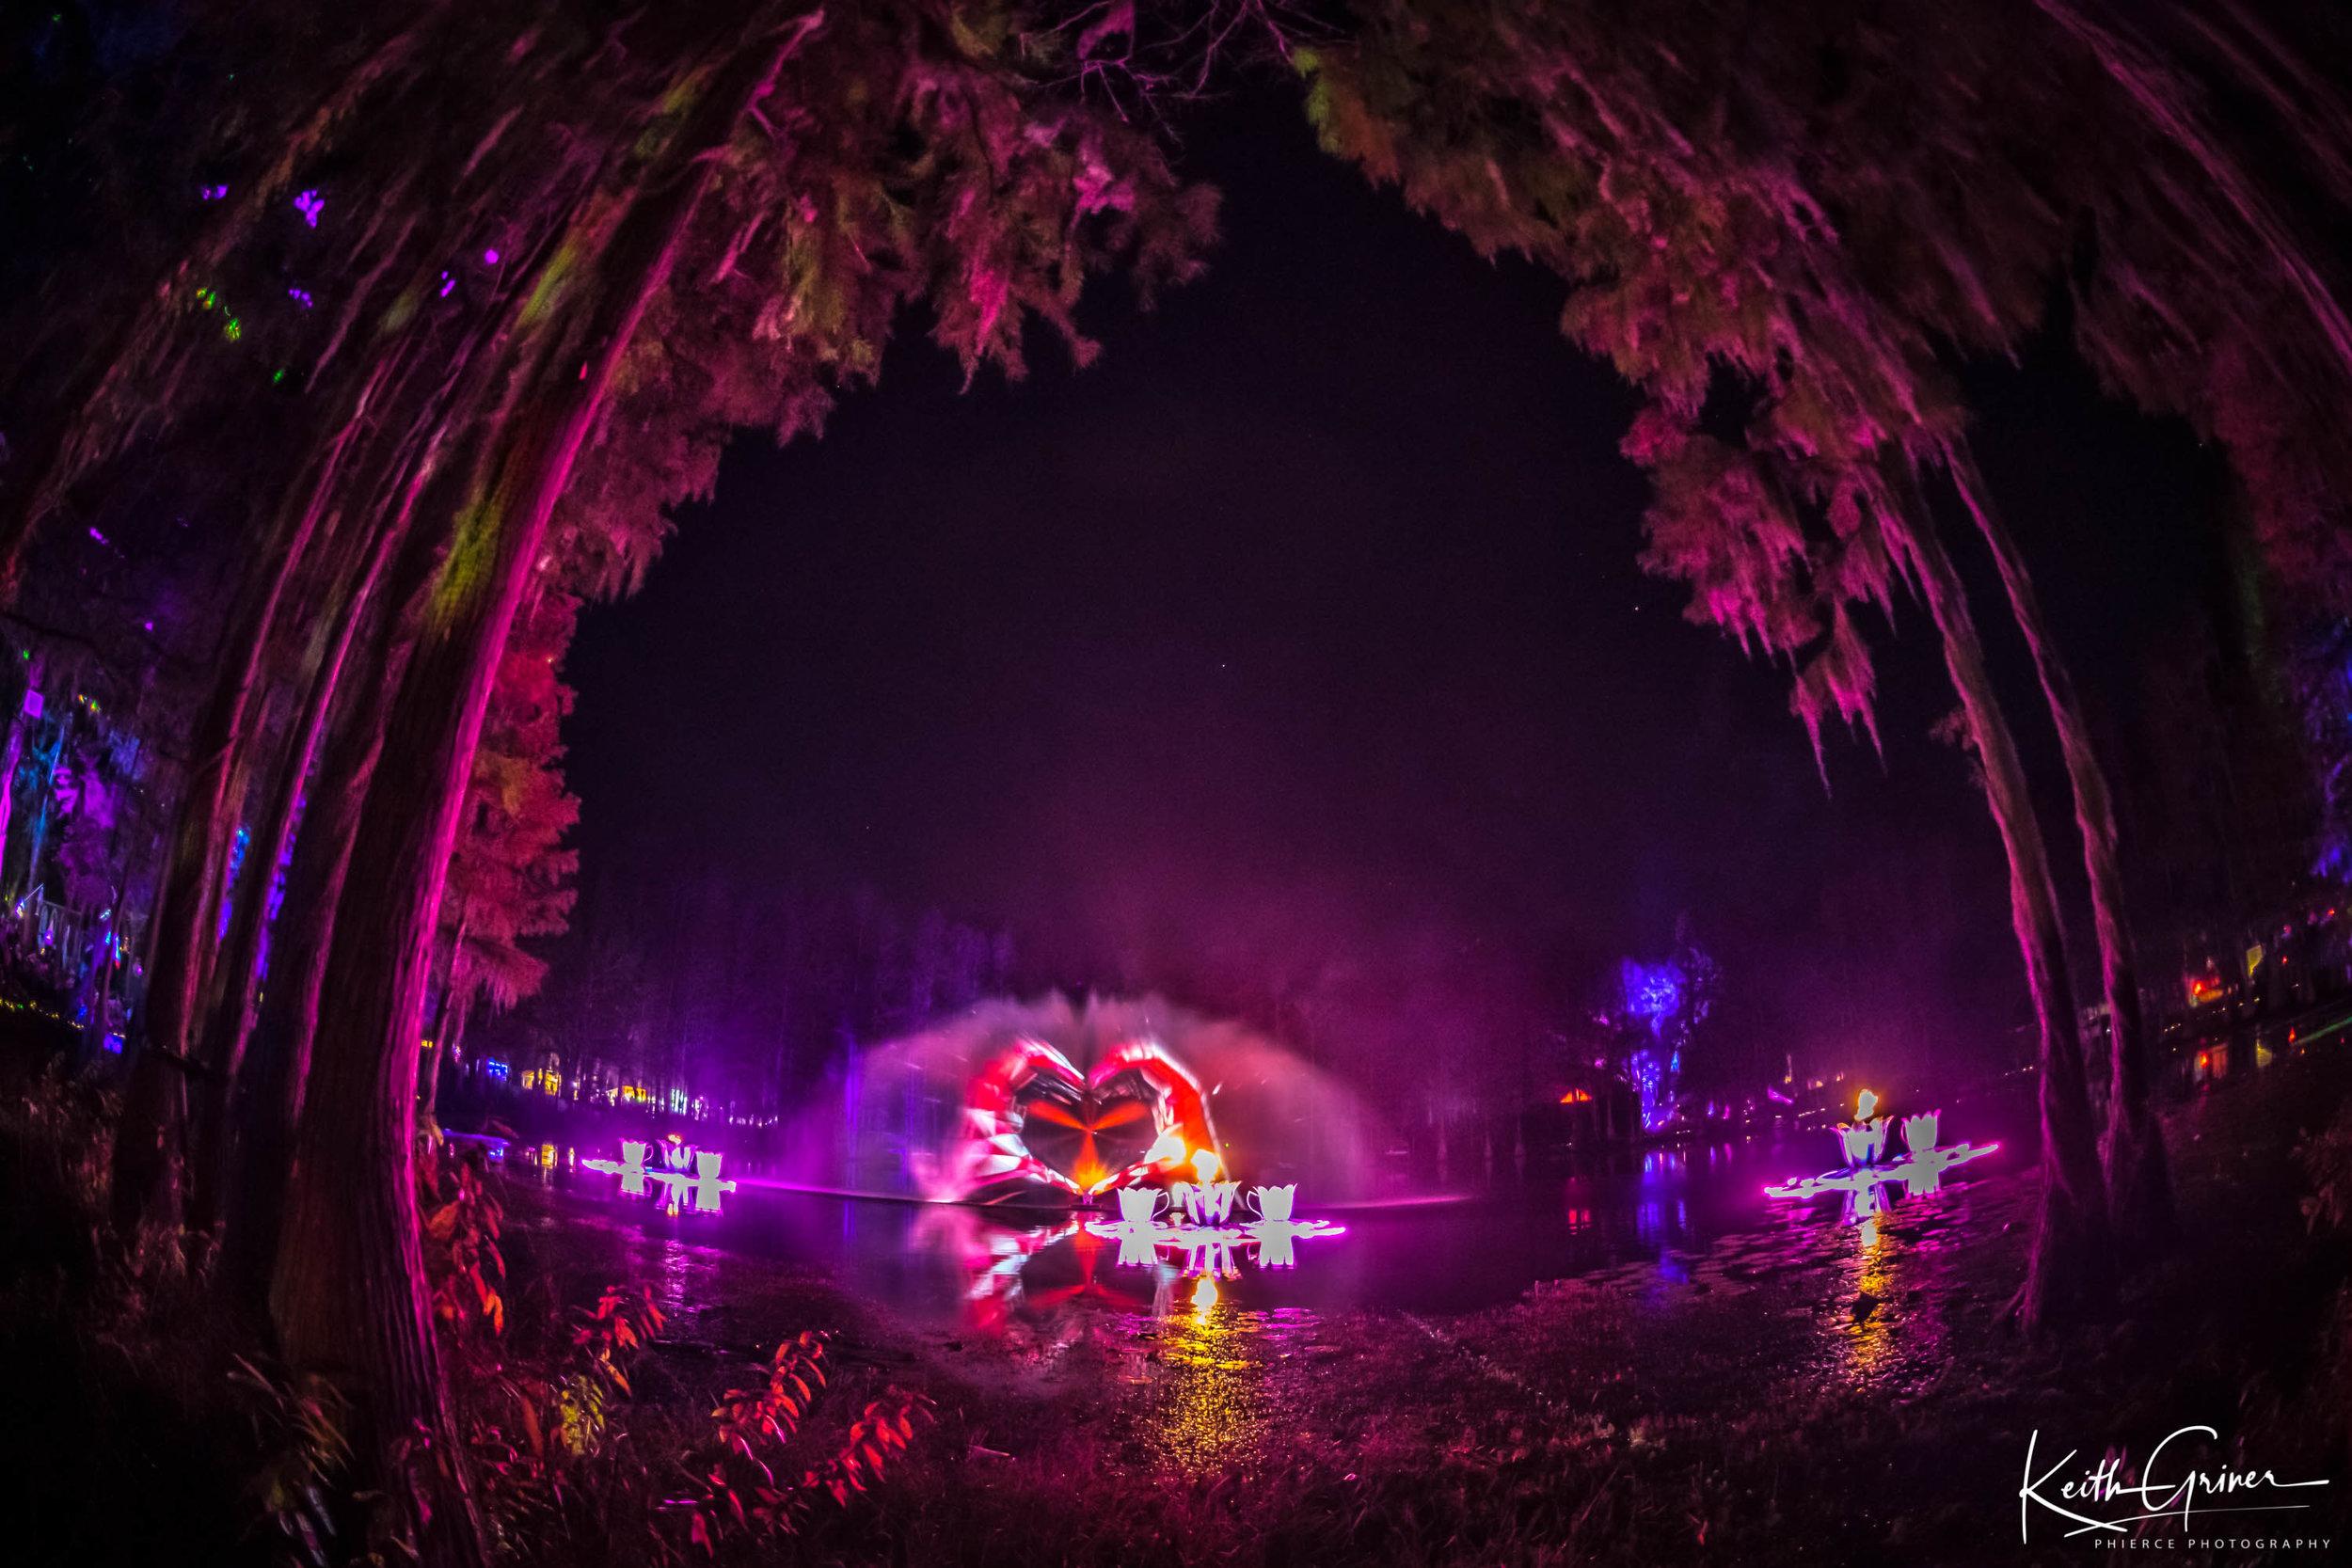 Hula_Spirit Lake_by Keith Griner 0D5_3108-Edit.jpg